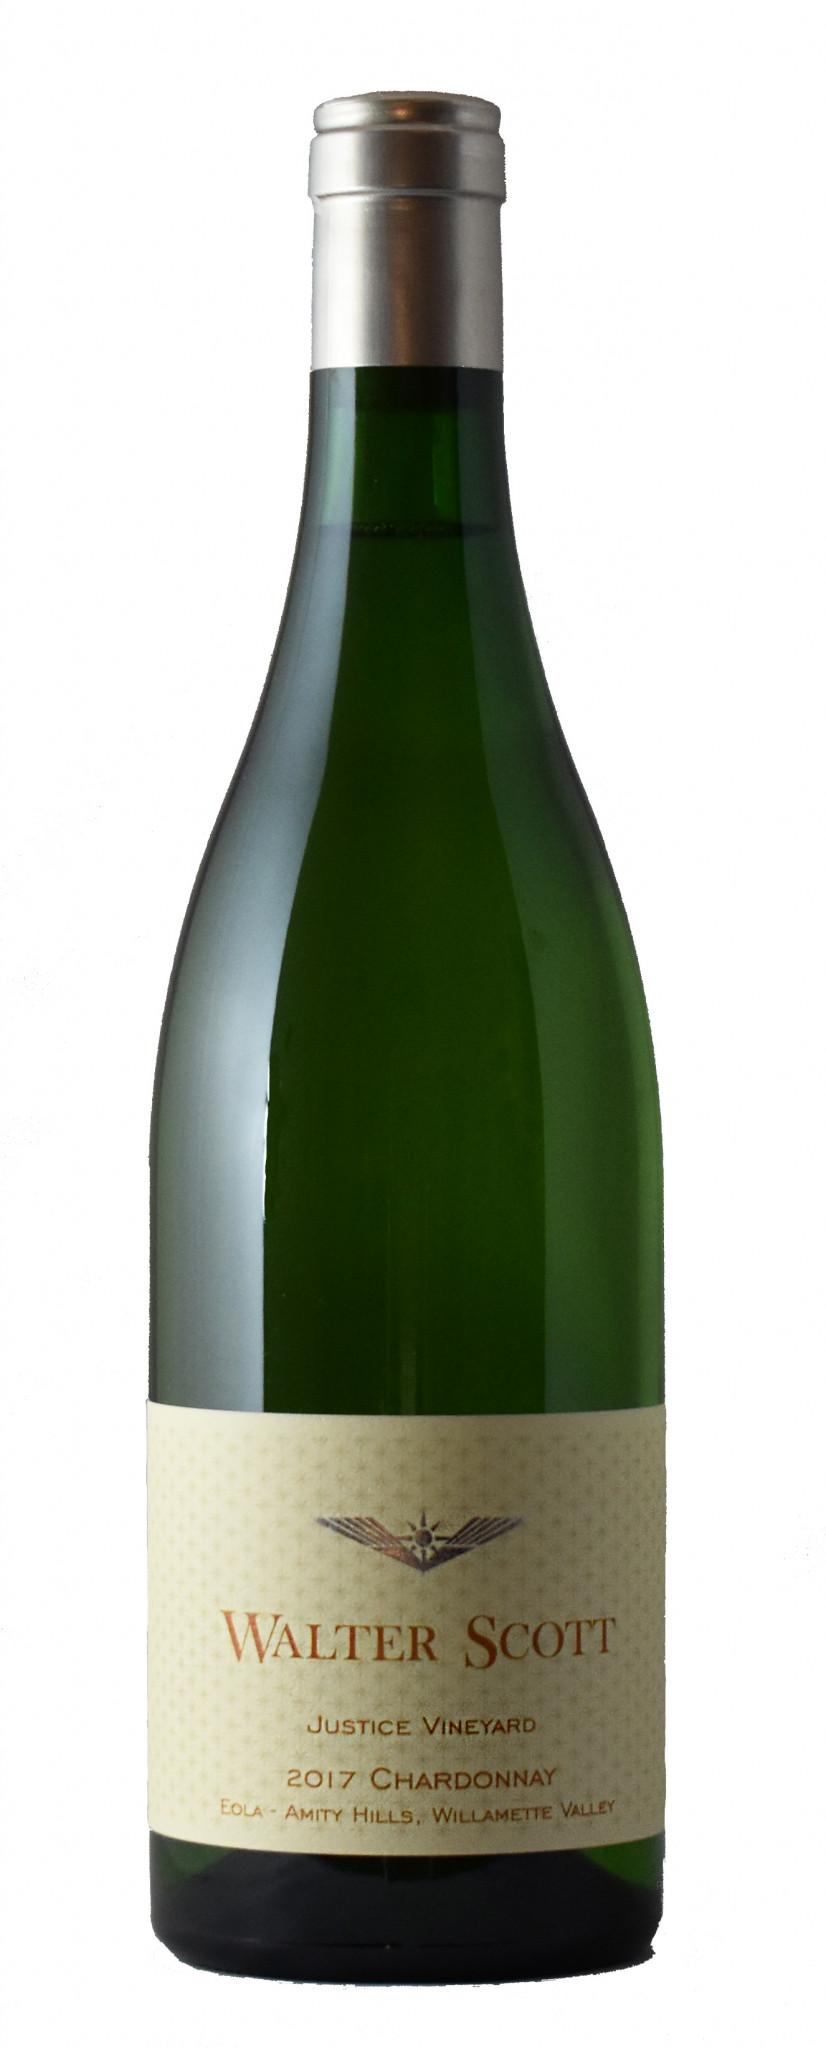 Walter Scott Justice Chardonnay